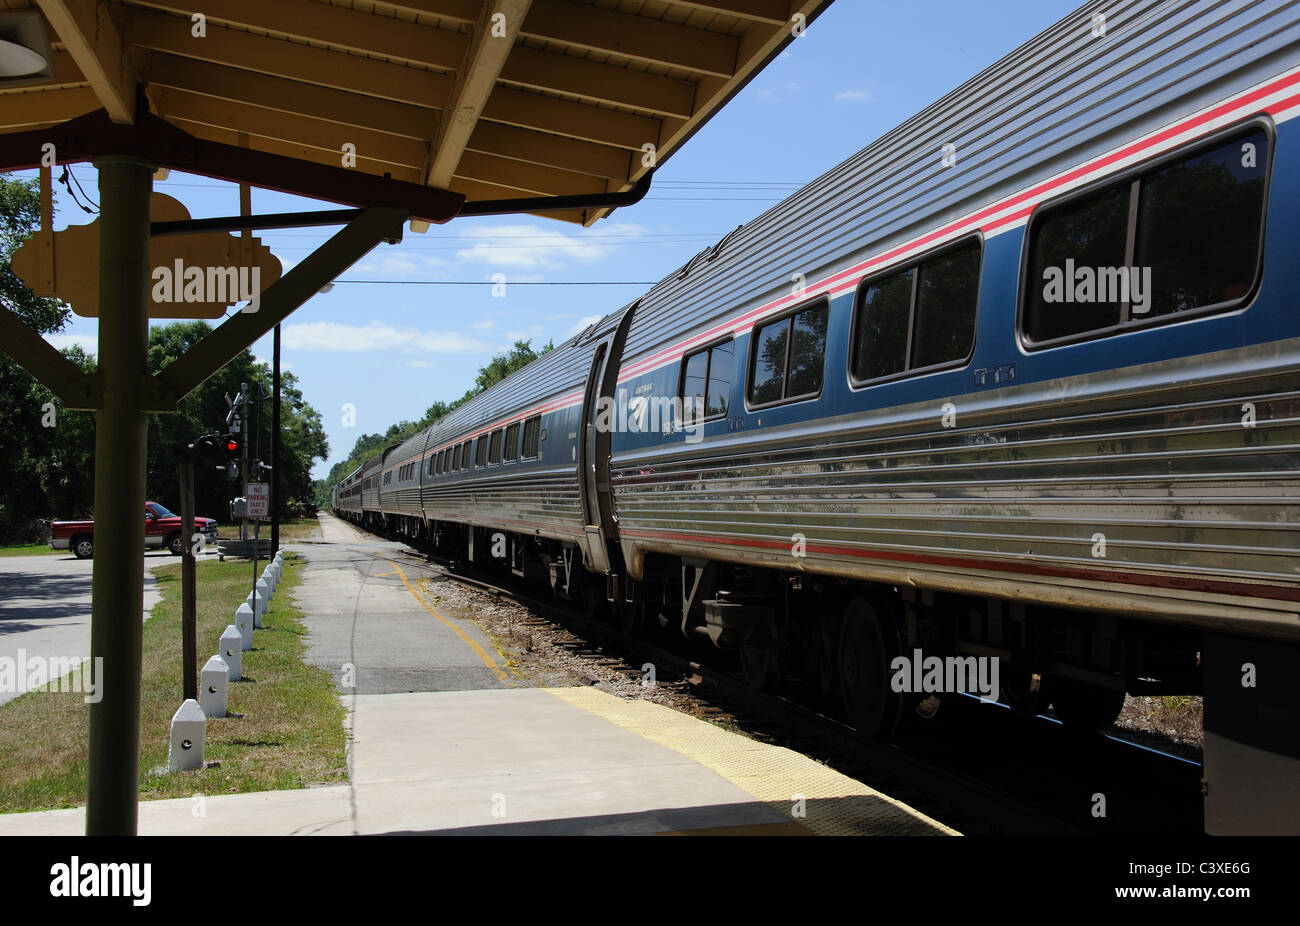 AMTRAK Silver Meteor passenger train departs Deland Railroad Station Florida USA bound for Miami on the Atlantic - Stock Image